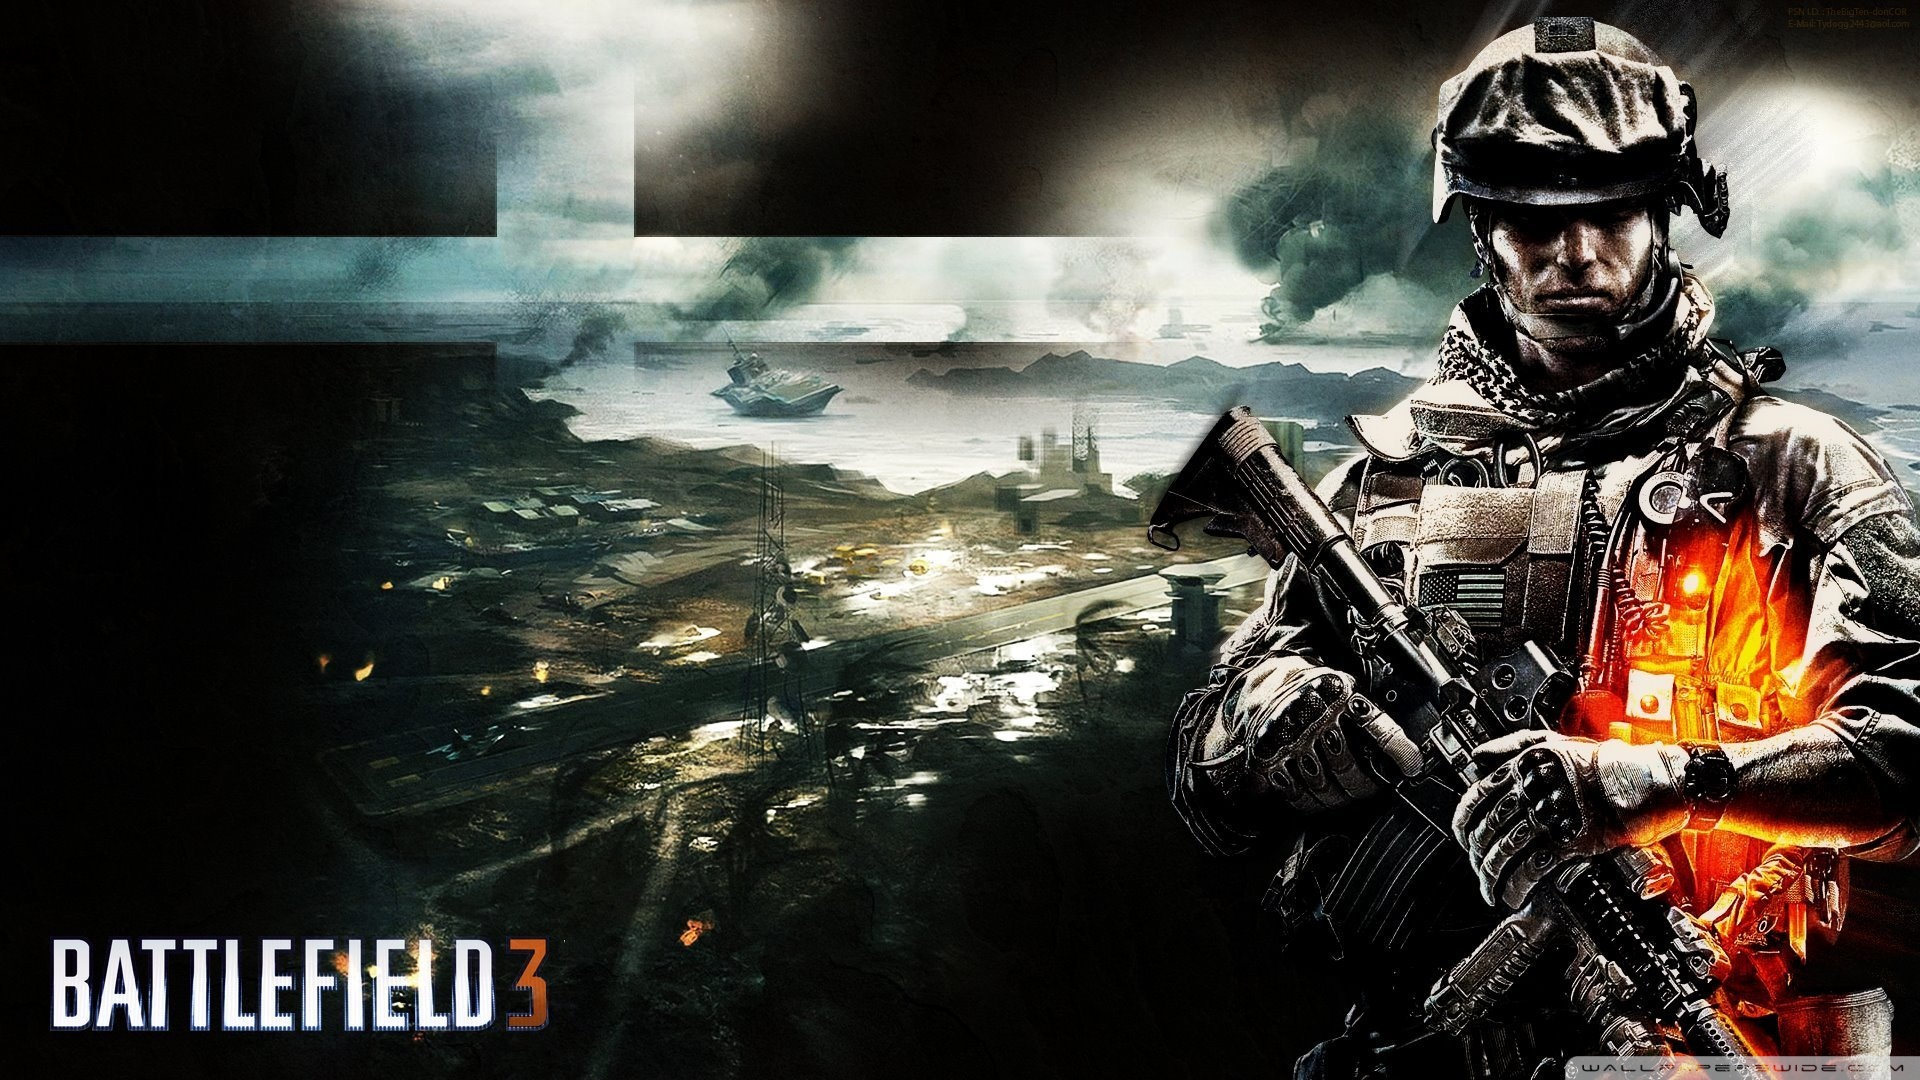 battlefield_3_b2k-wallpaper-1920x1080+1.jpg